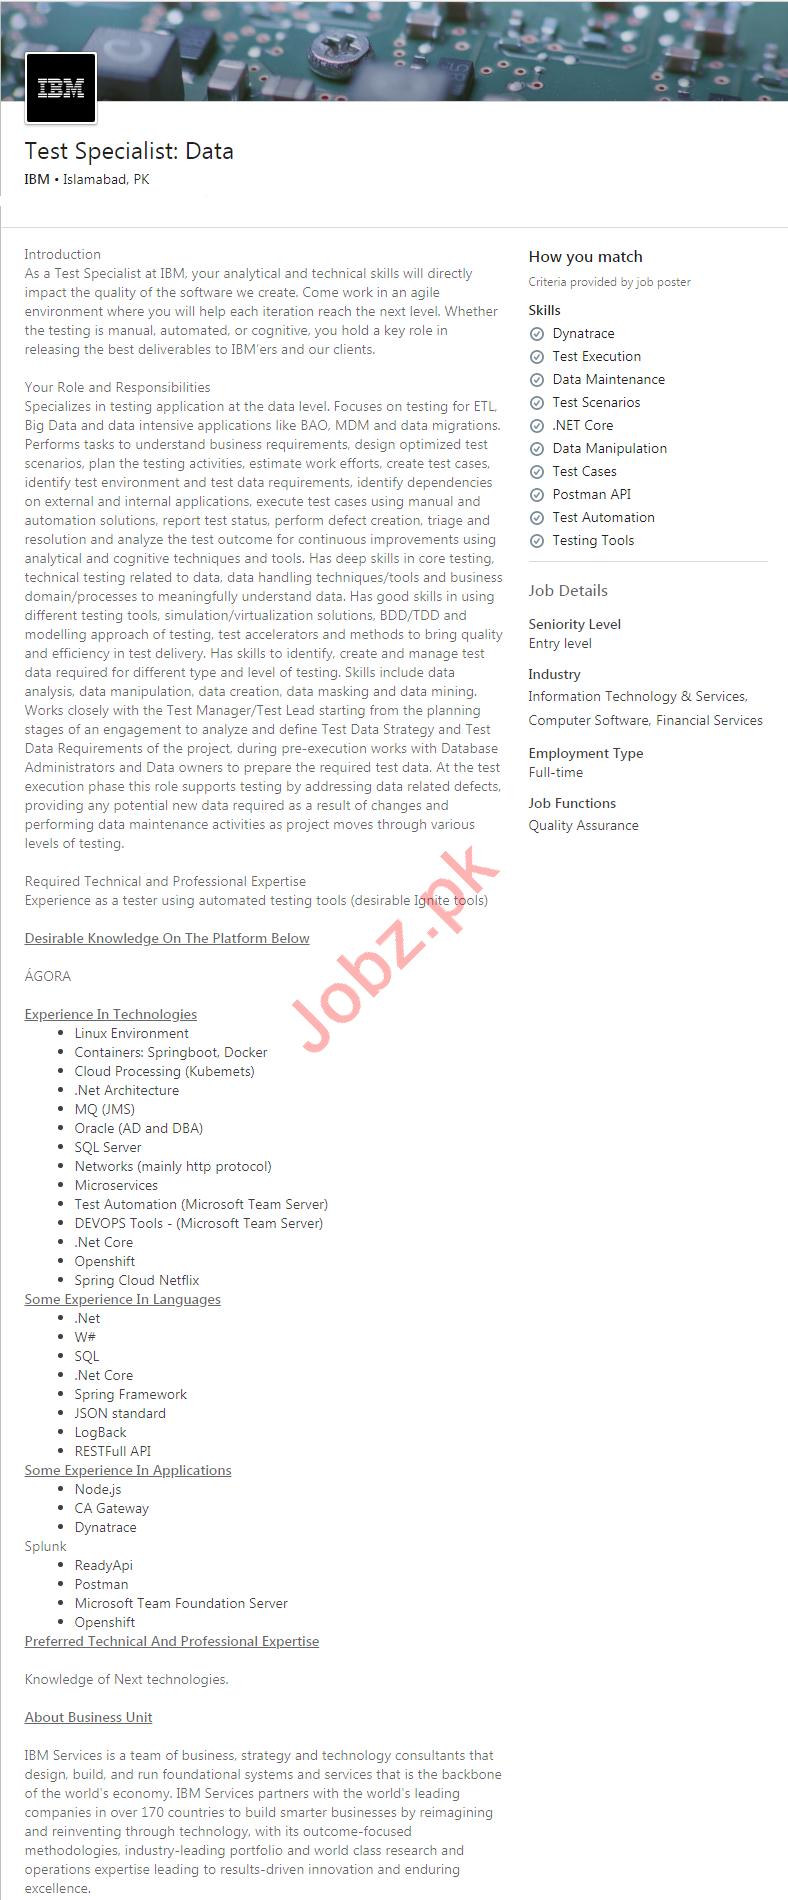 IBM Pakistan Jobs 2020 for Test Specialist